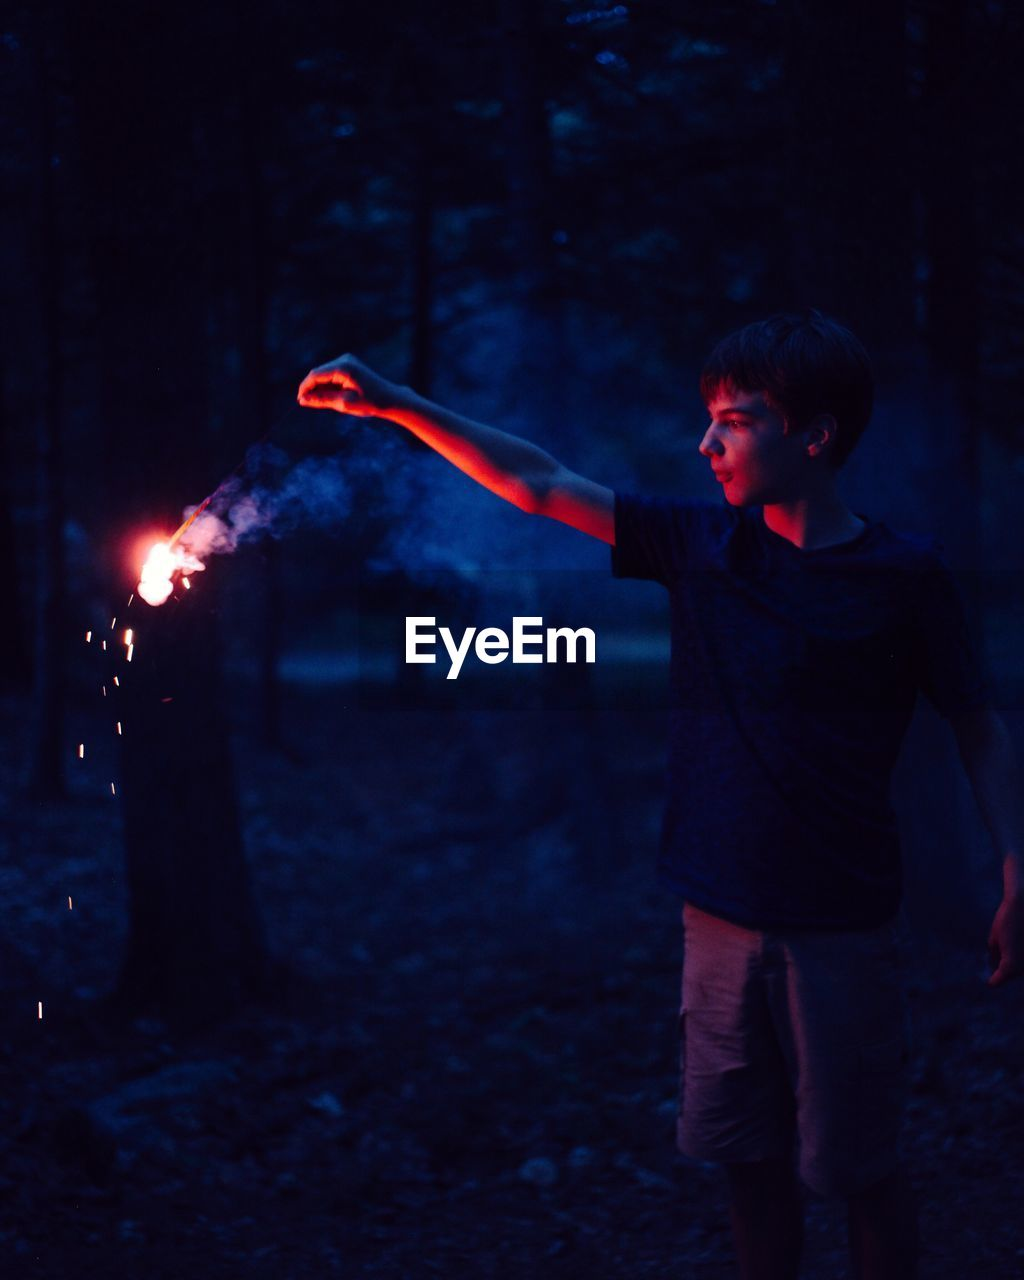 Boy Holding Burning Stick In Forest At Dusk